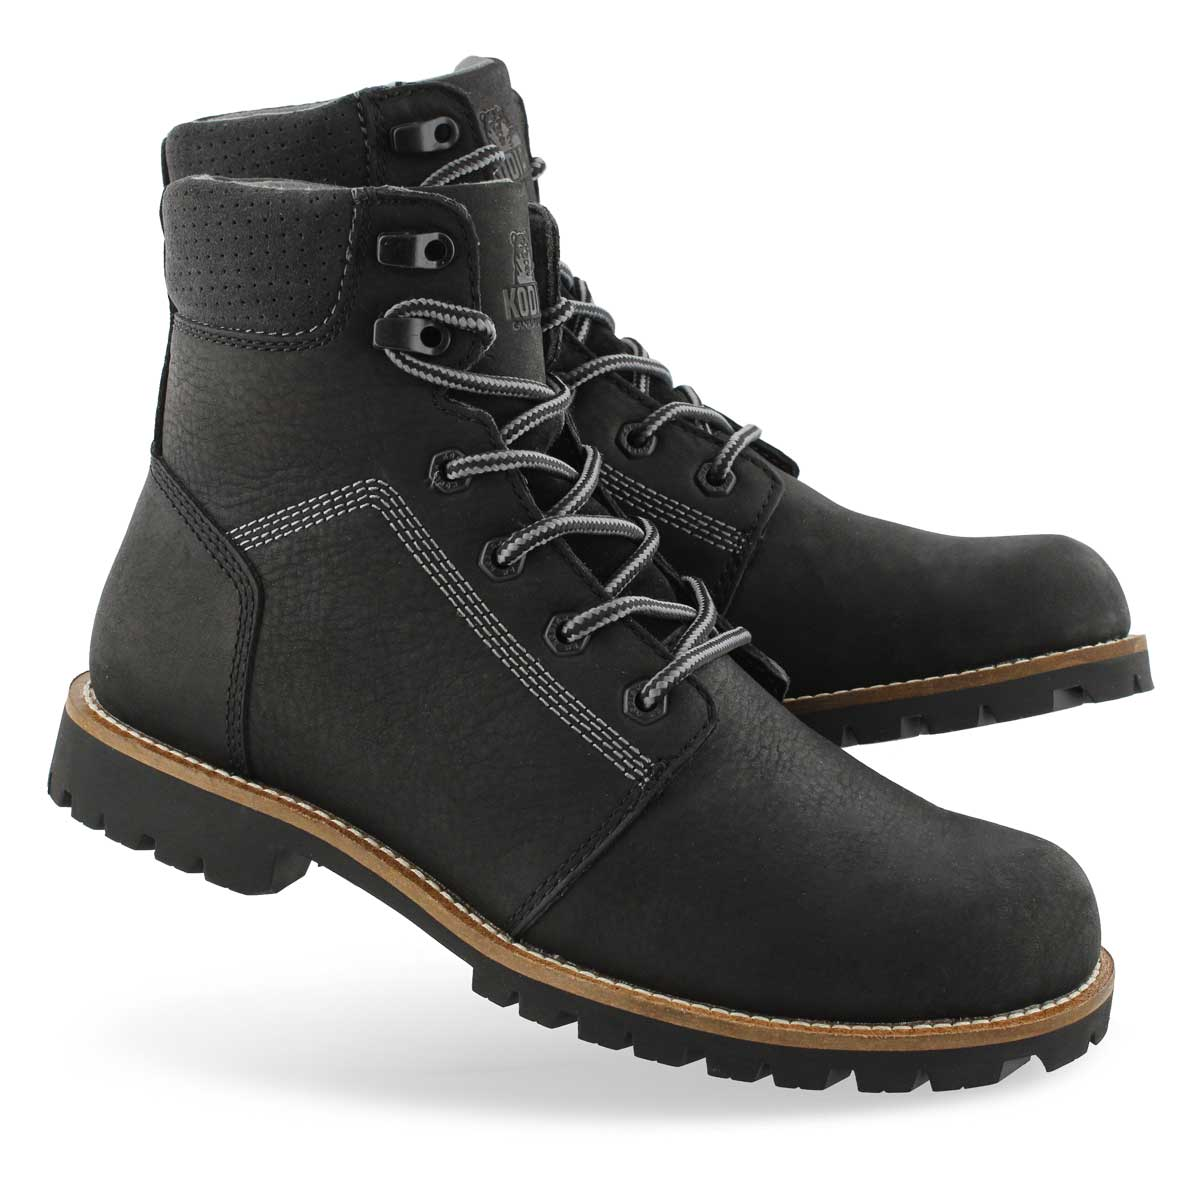 Mns Thompson black wtpf ankle boot